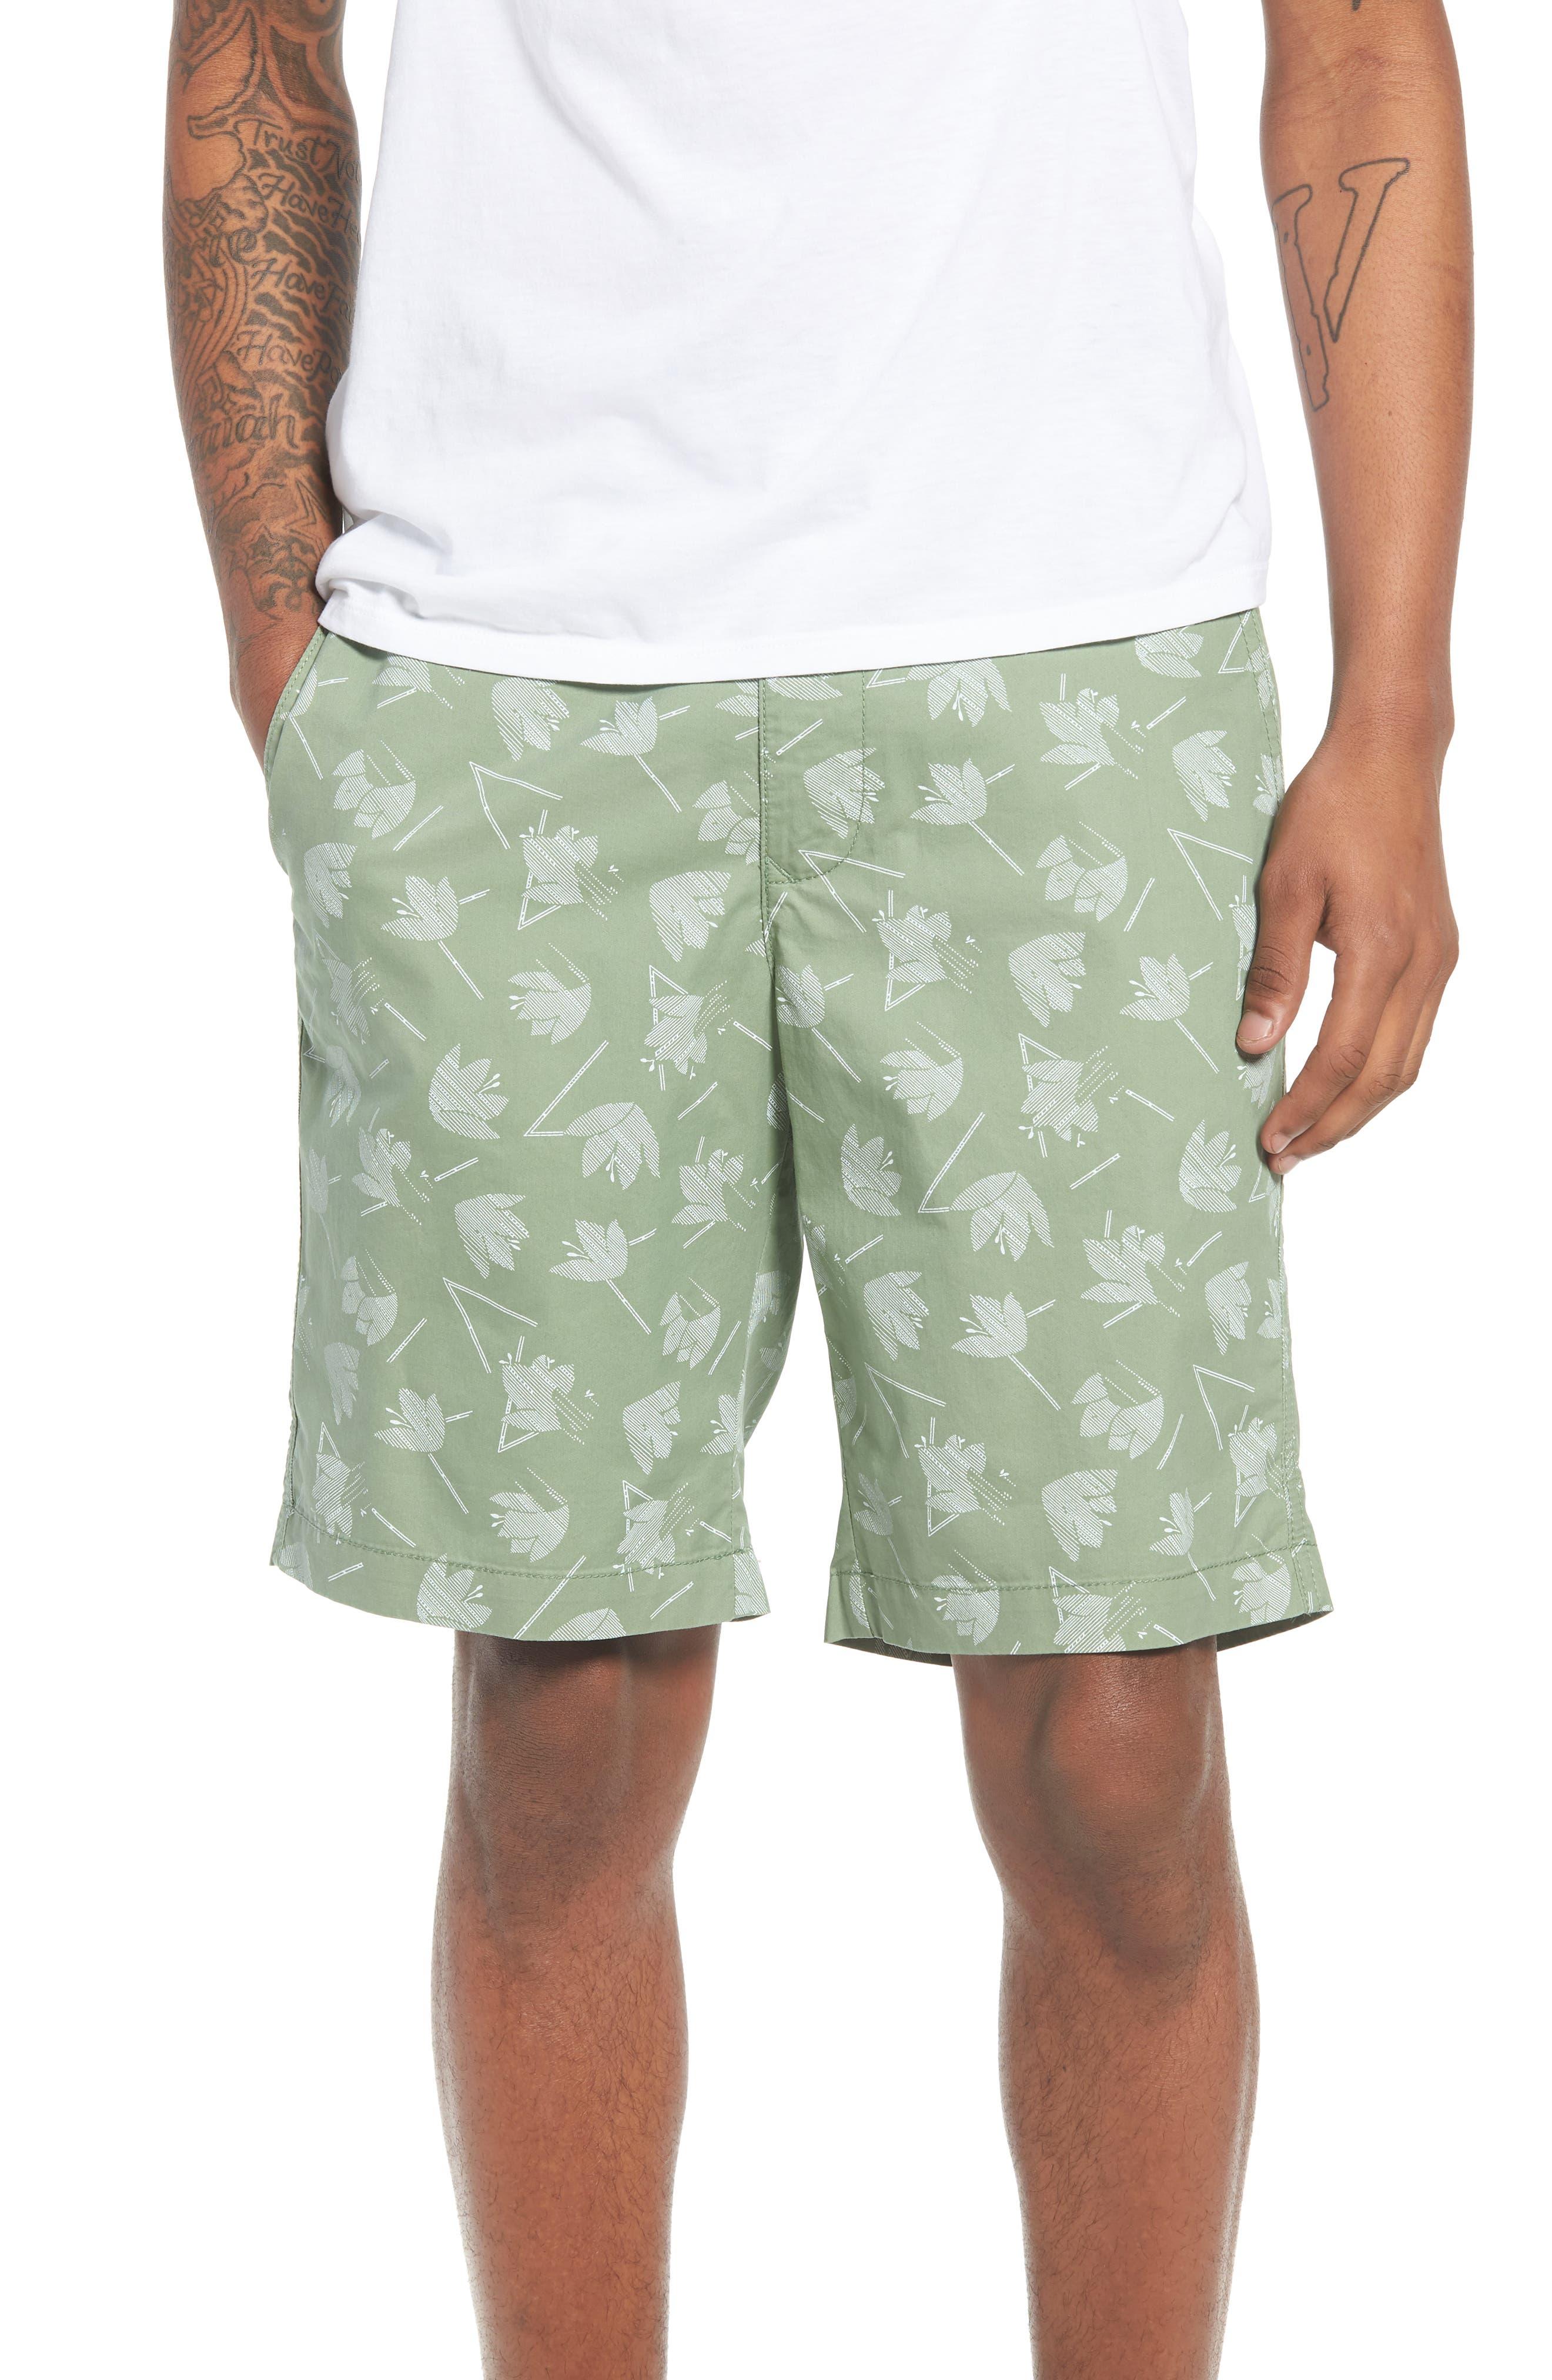 Deco Floral Print Shorts,                         Main,                         color, Green Hedge Deco Floral